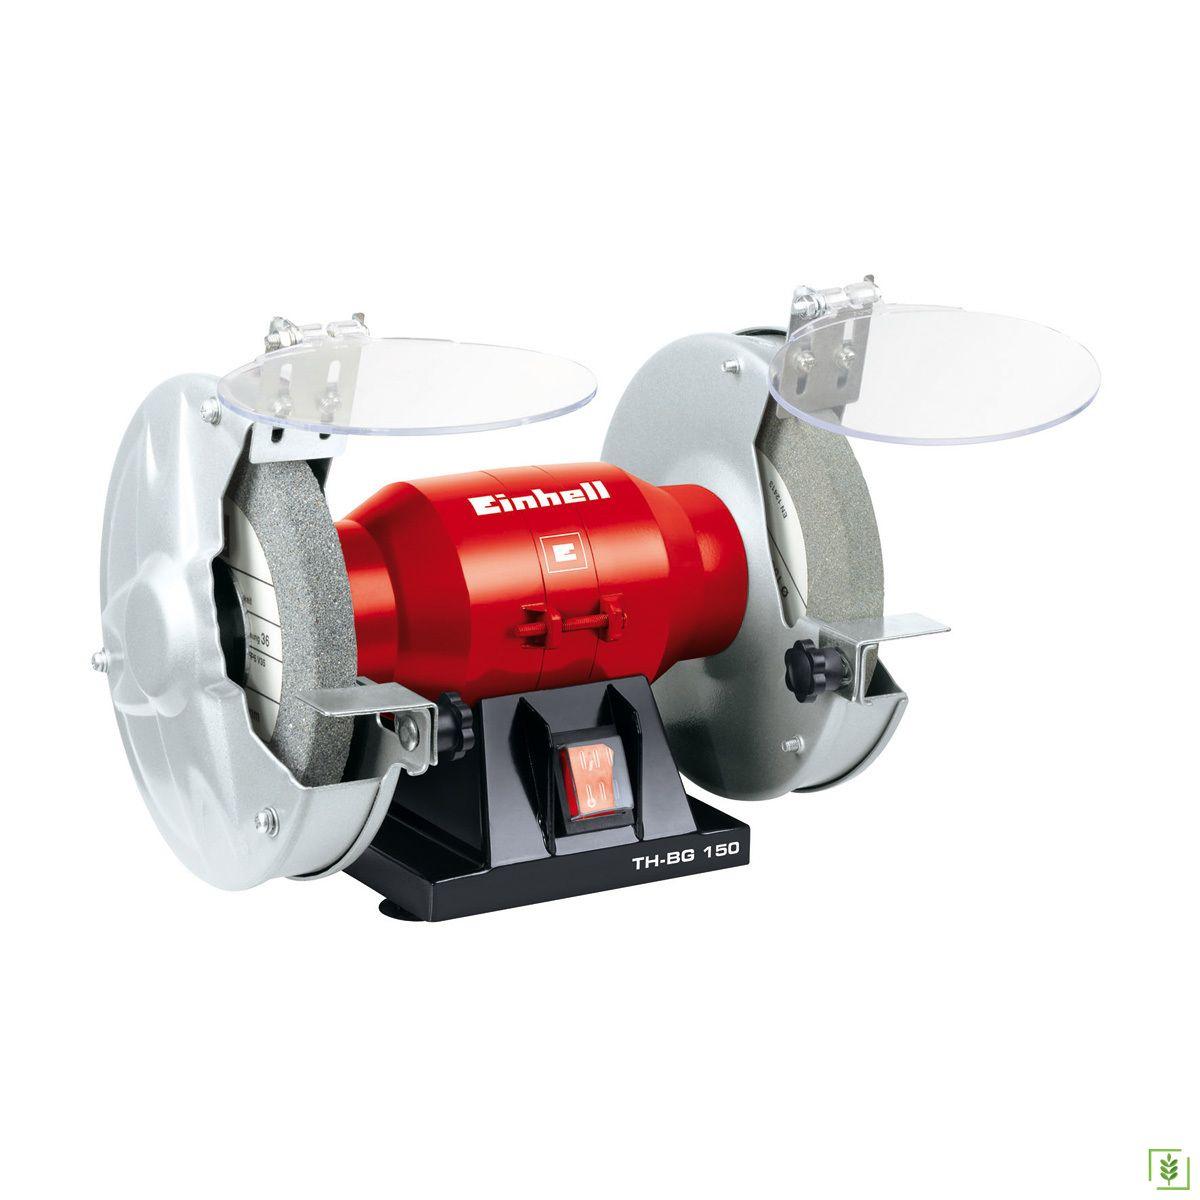 Einhell Th-Bg 150 Taş Motoru